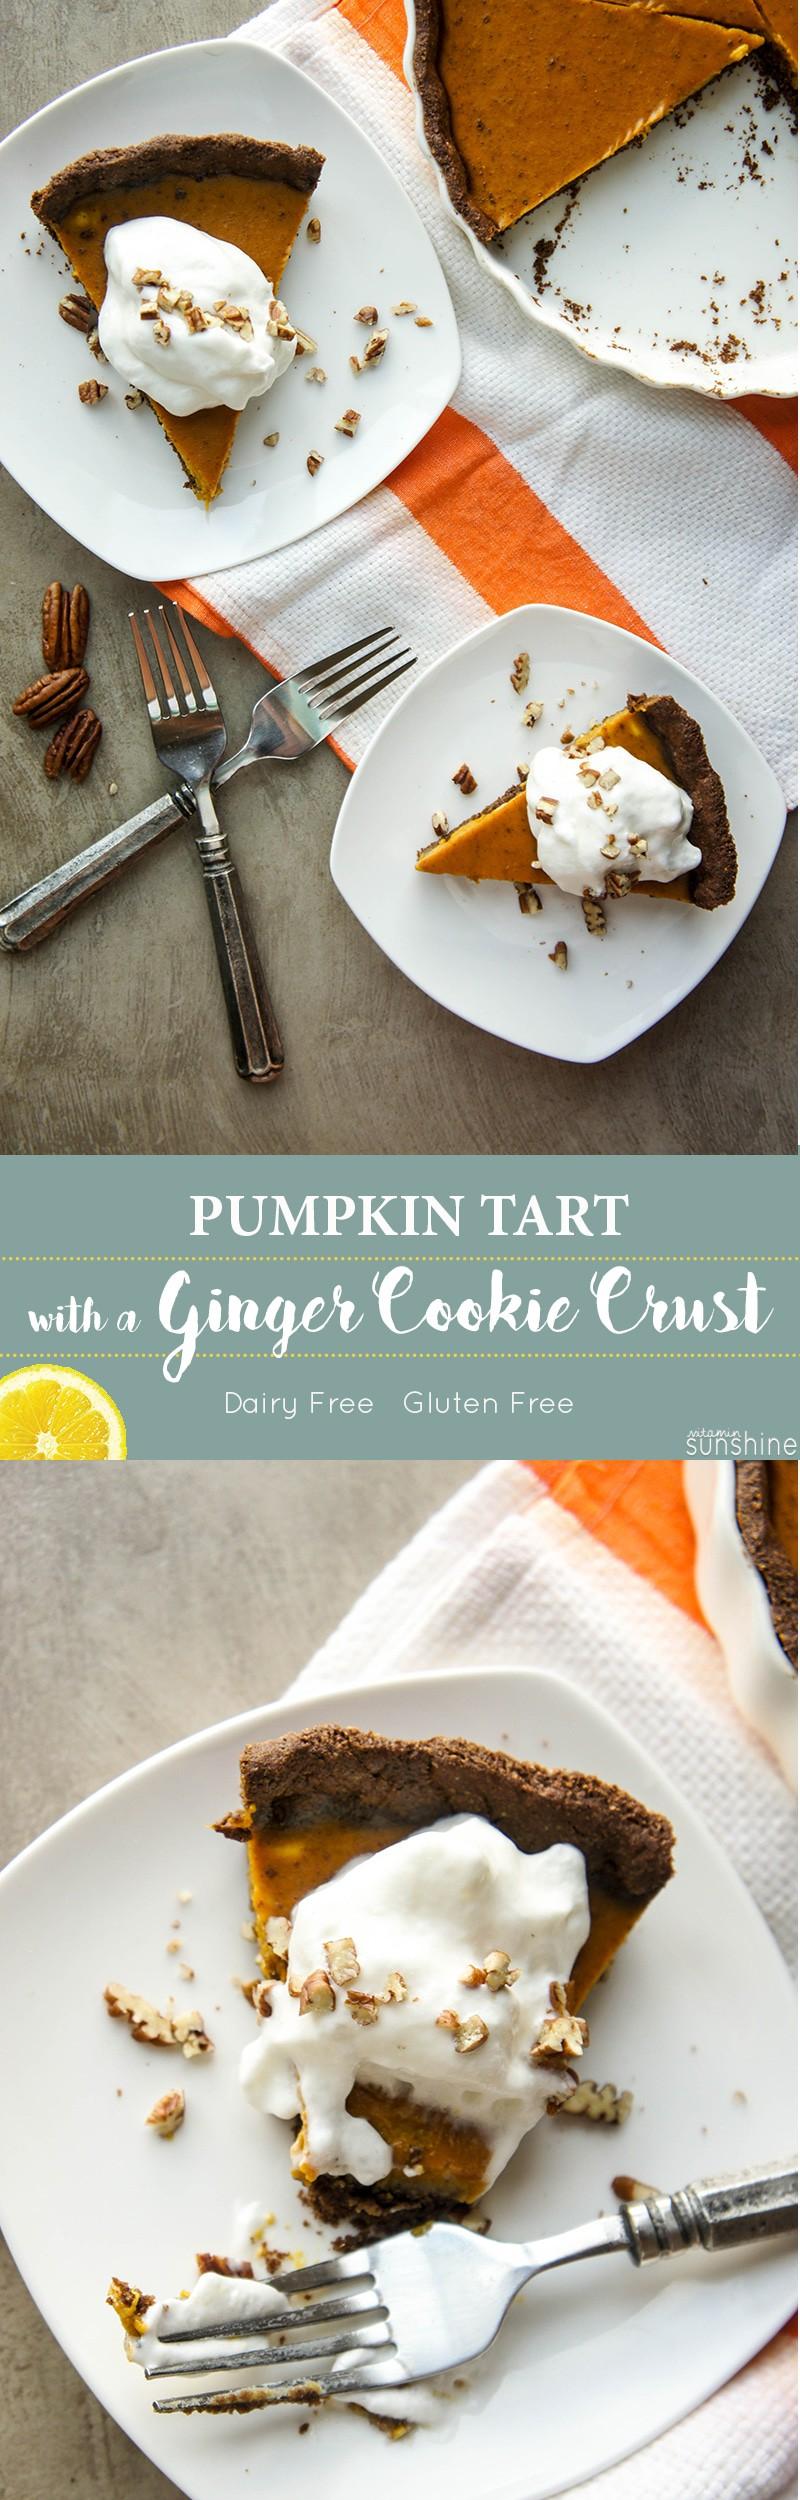 Pumpkin Tart with a Ginger Cookie Crust - Vitamin Sunshine